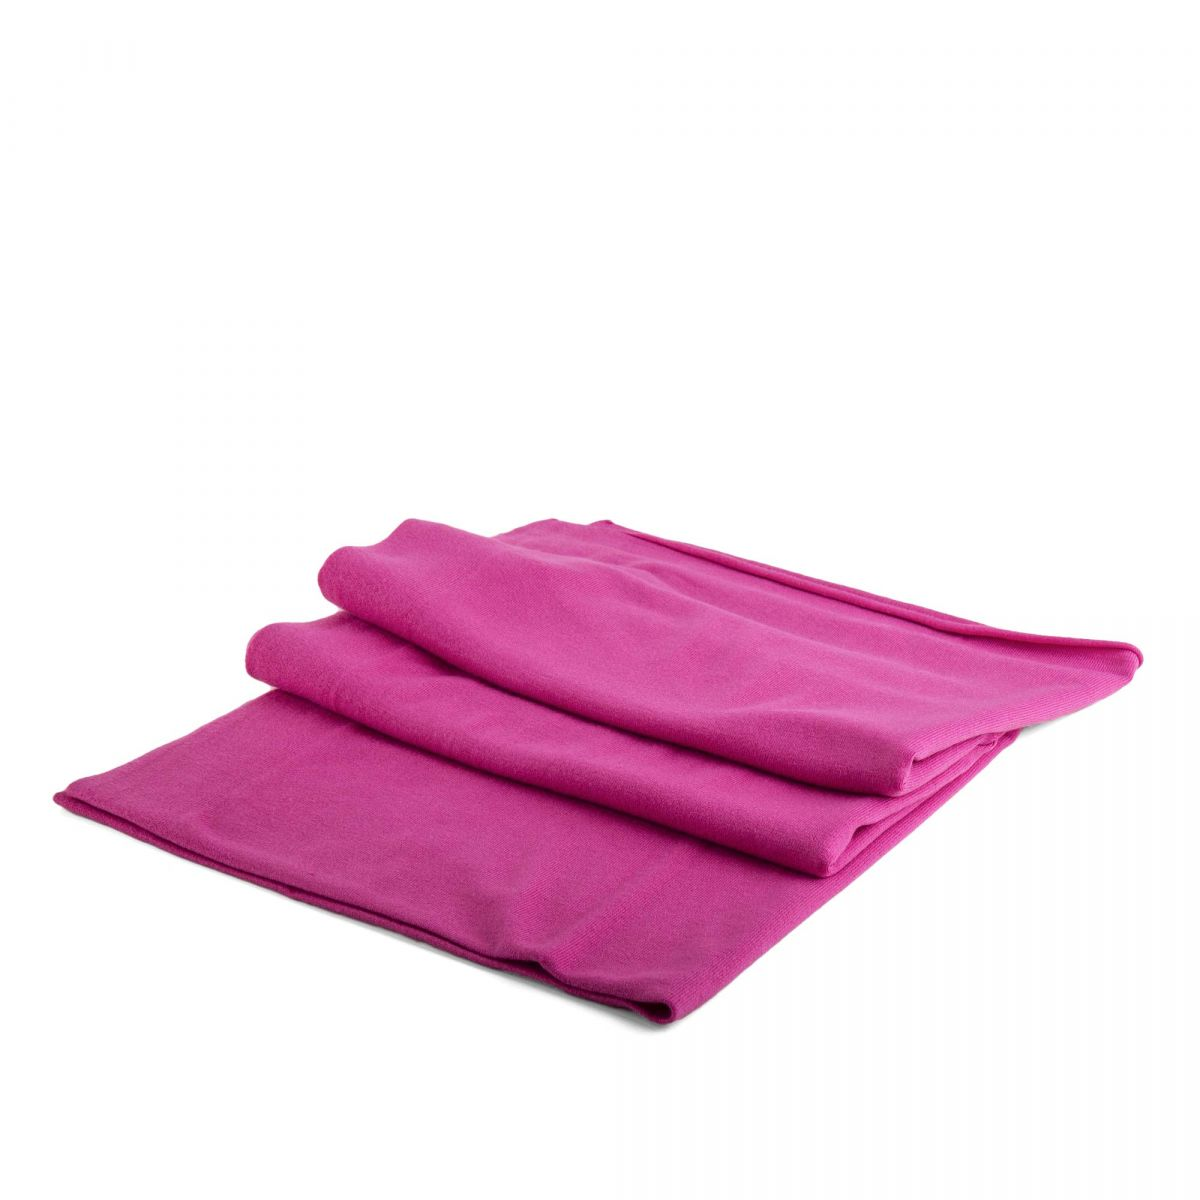 echarpe laine cachemire femme real cashmere prix d griff. Black Bedroom Furniture Sets. Home Design Ideas